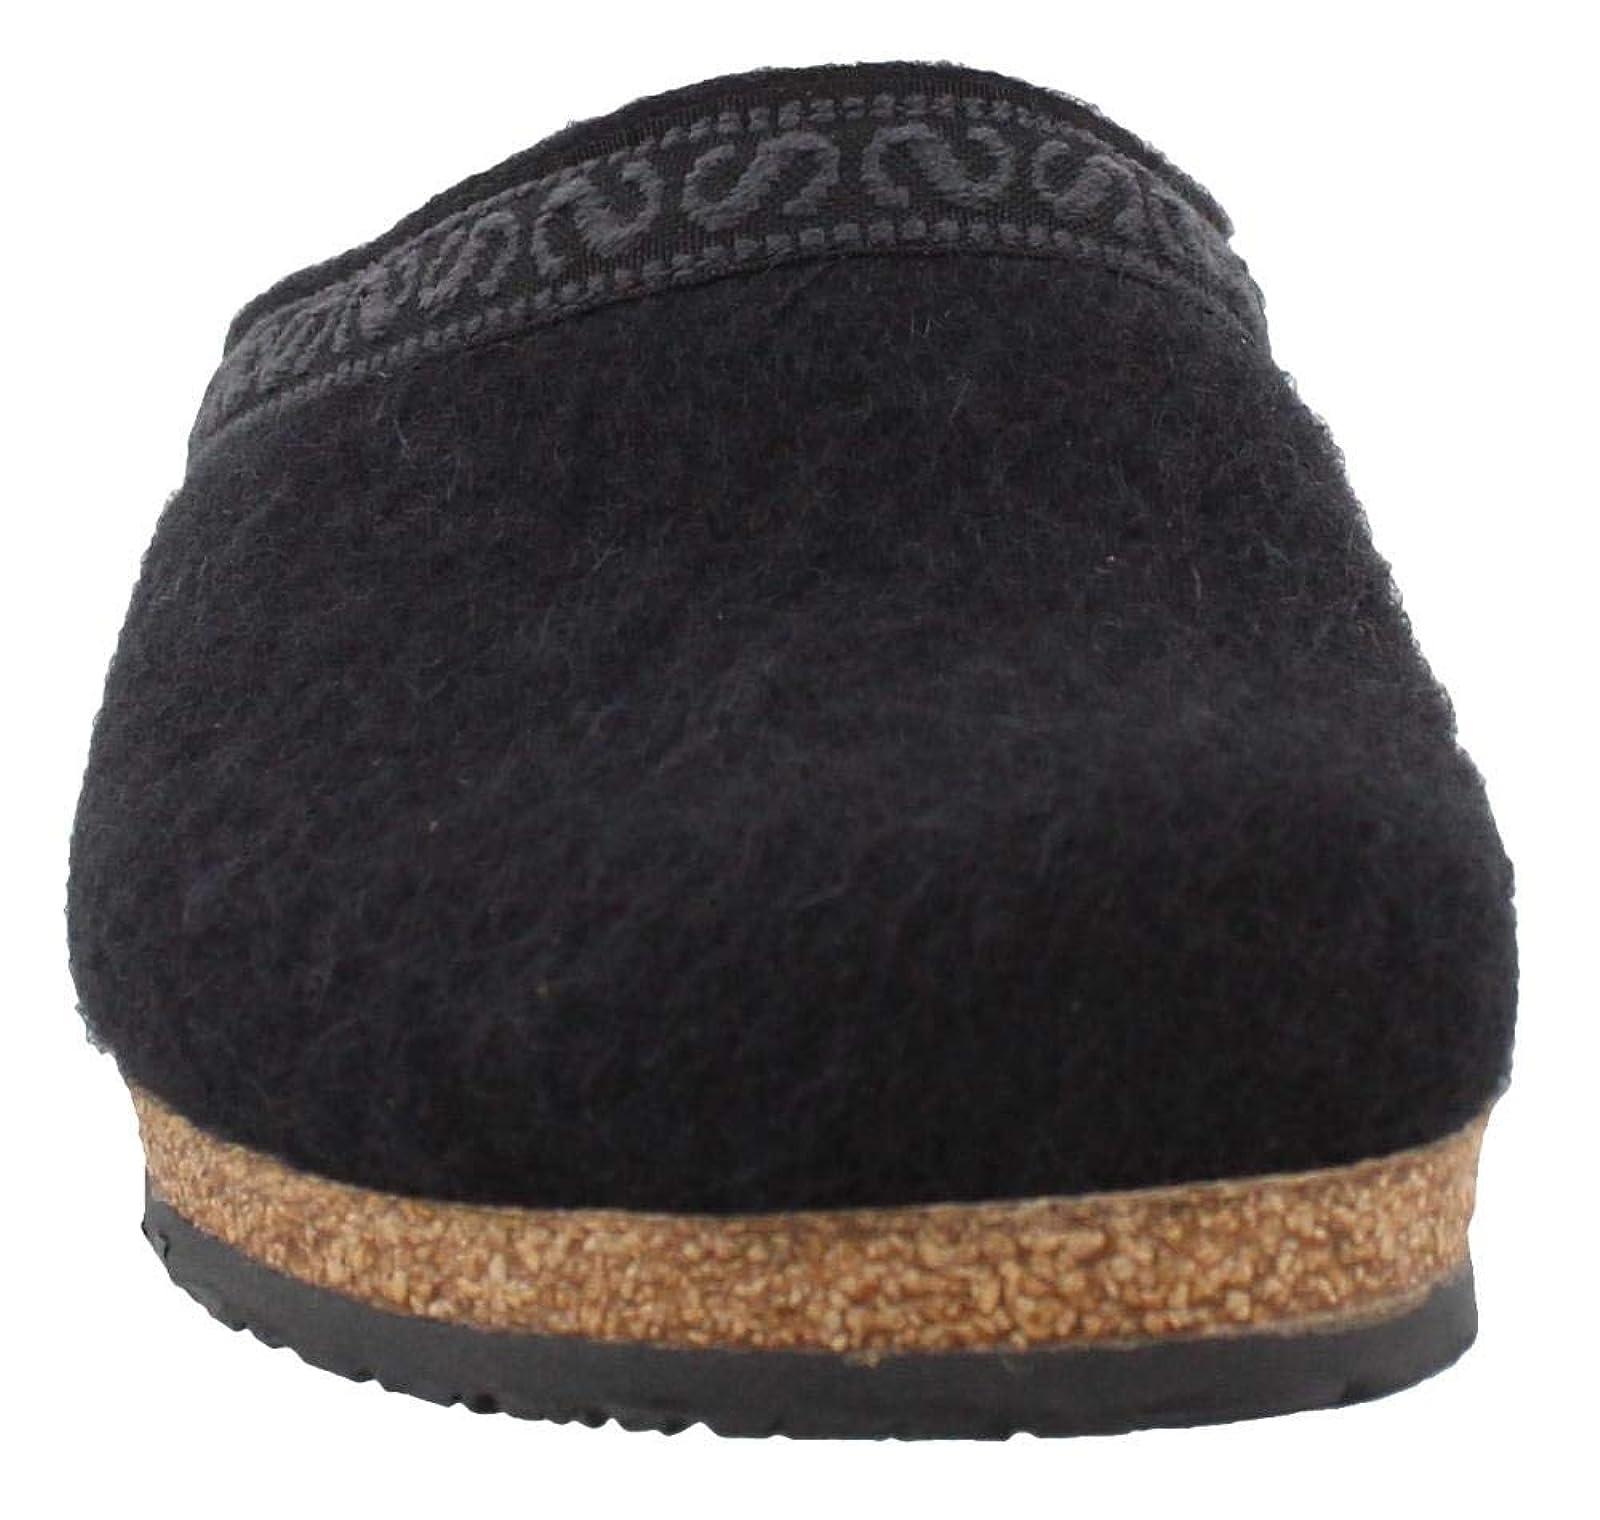 stegmann women's wool clogs